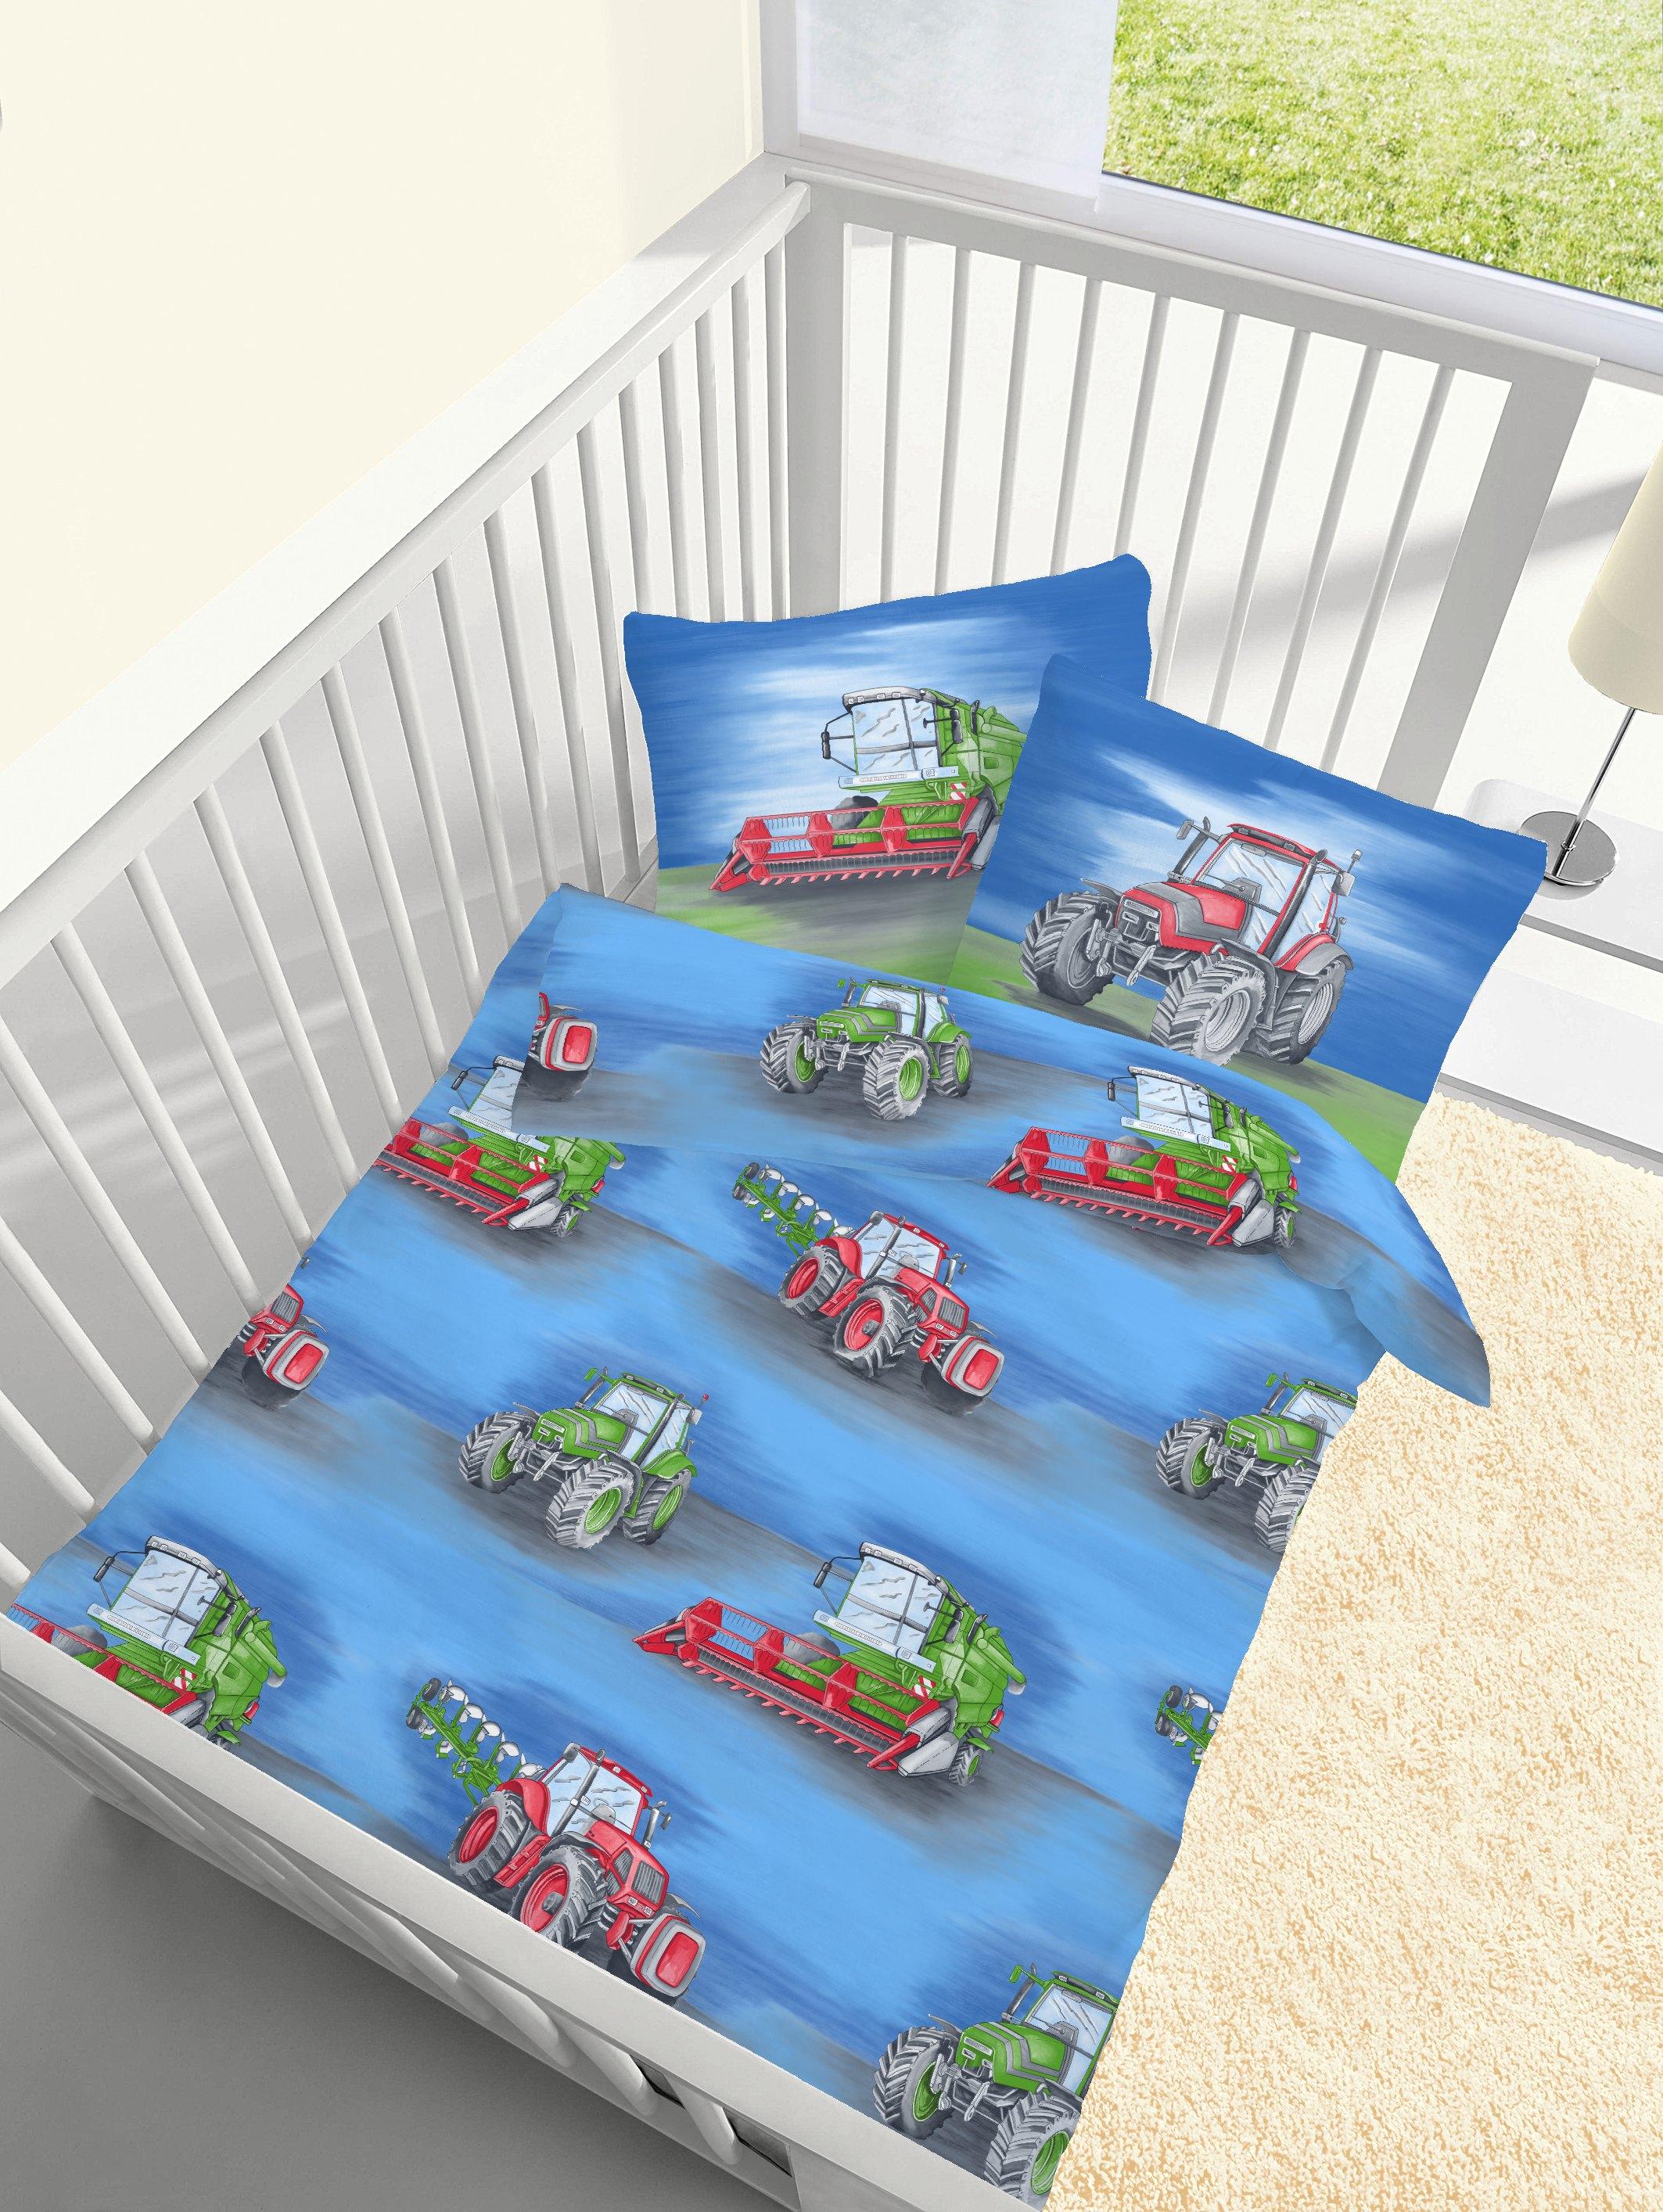 tr umsch n biber baby bettw sche 100 135 cm traktor blau 100 135 baby kinder u jugend. Black Bedroom Furniture Sets. Home Design Ideas